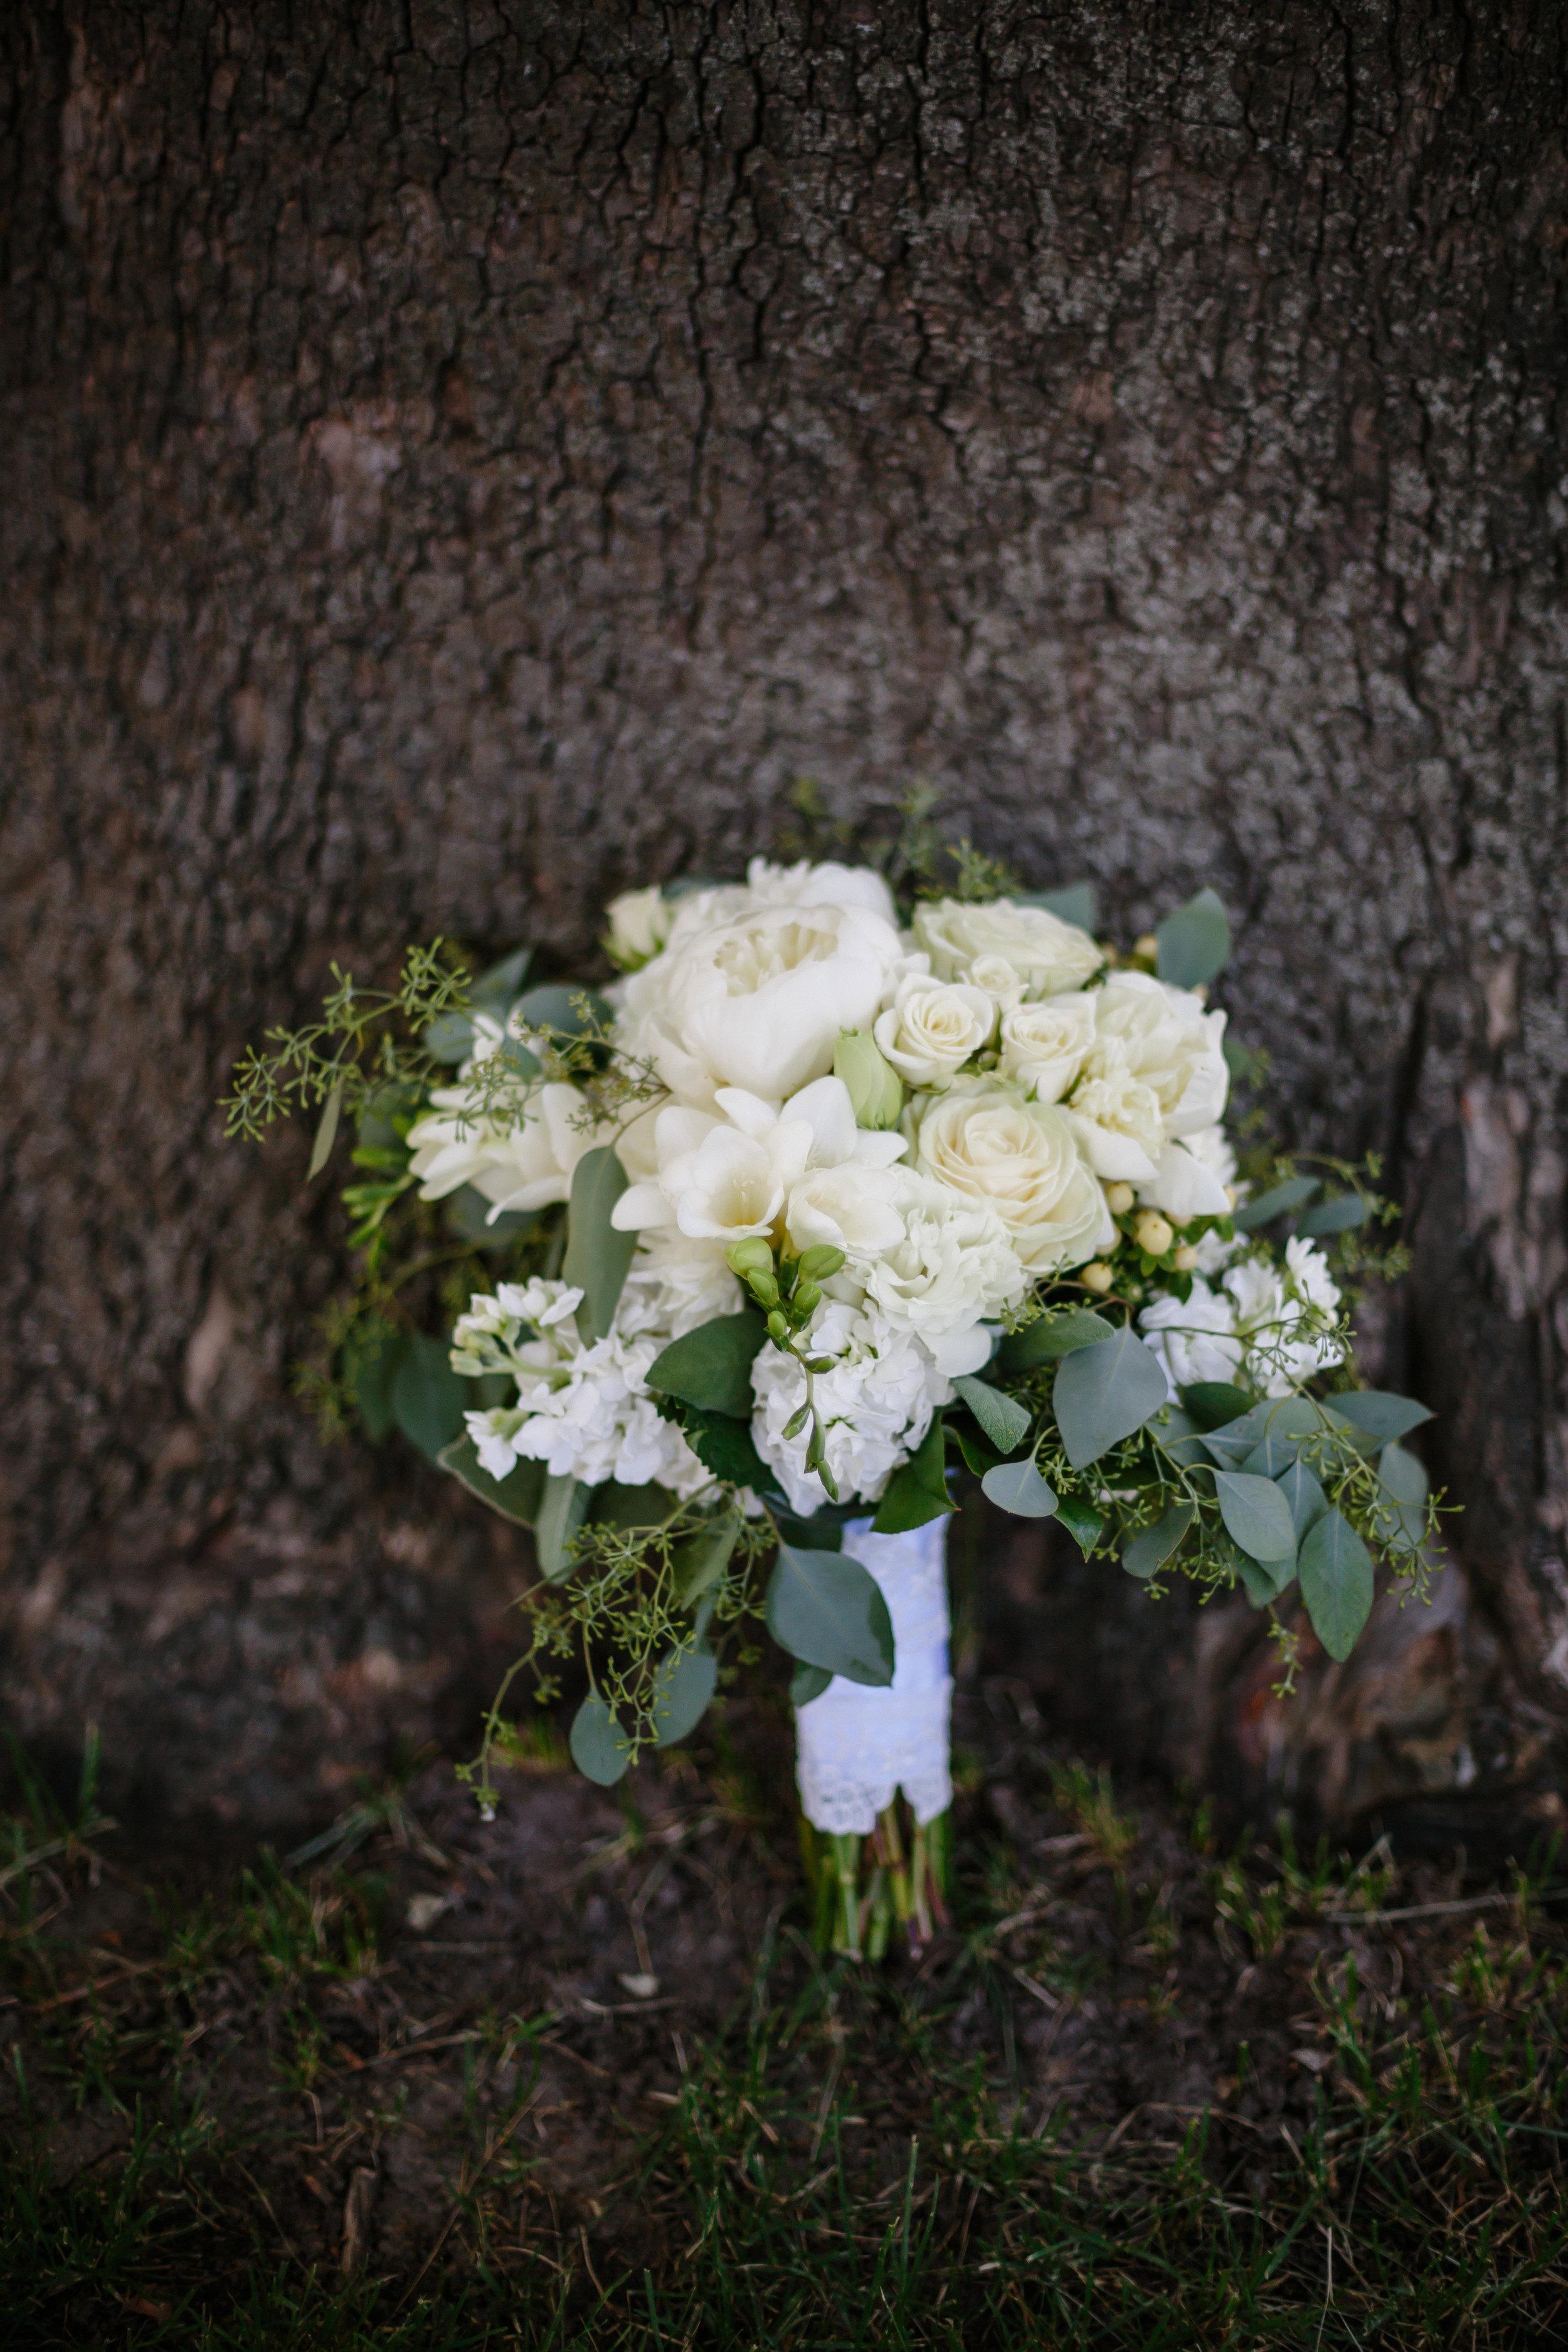 Jordan & Shantel Married - Idaho - Corrie Mick Photography-46.jpg